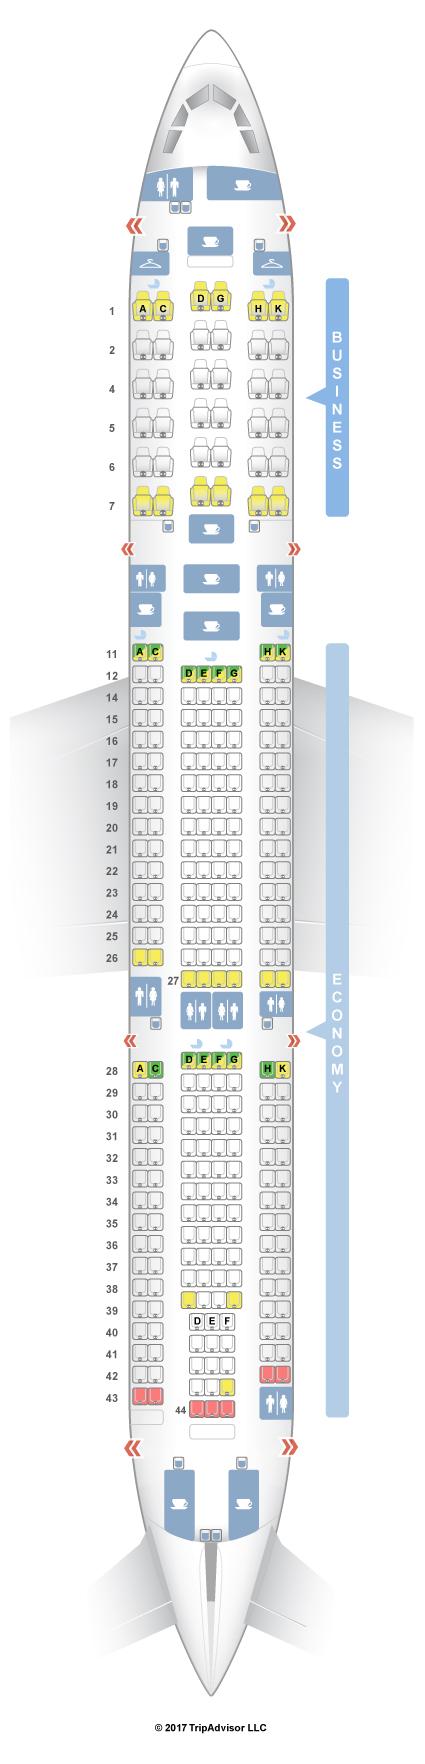 Seatguru Seat Map Malaysia Airlines Airbus A330 300 333 V2